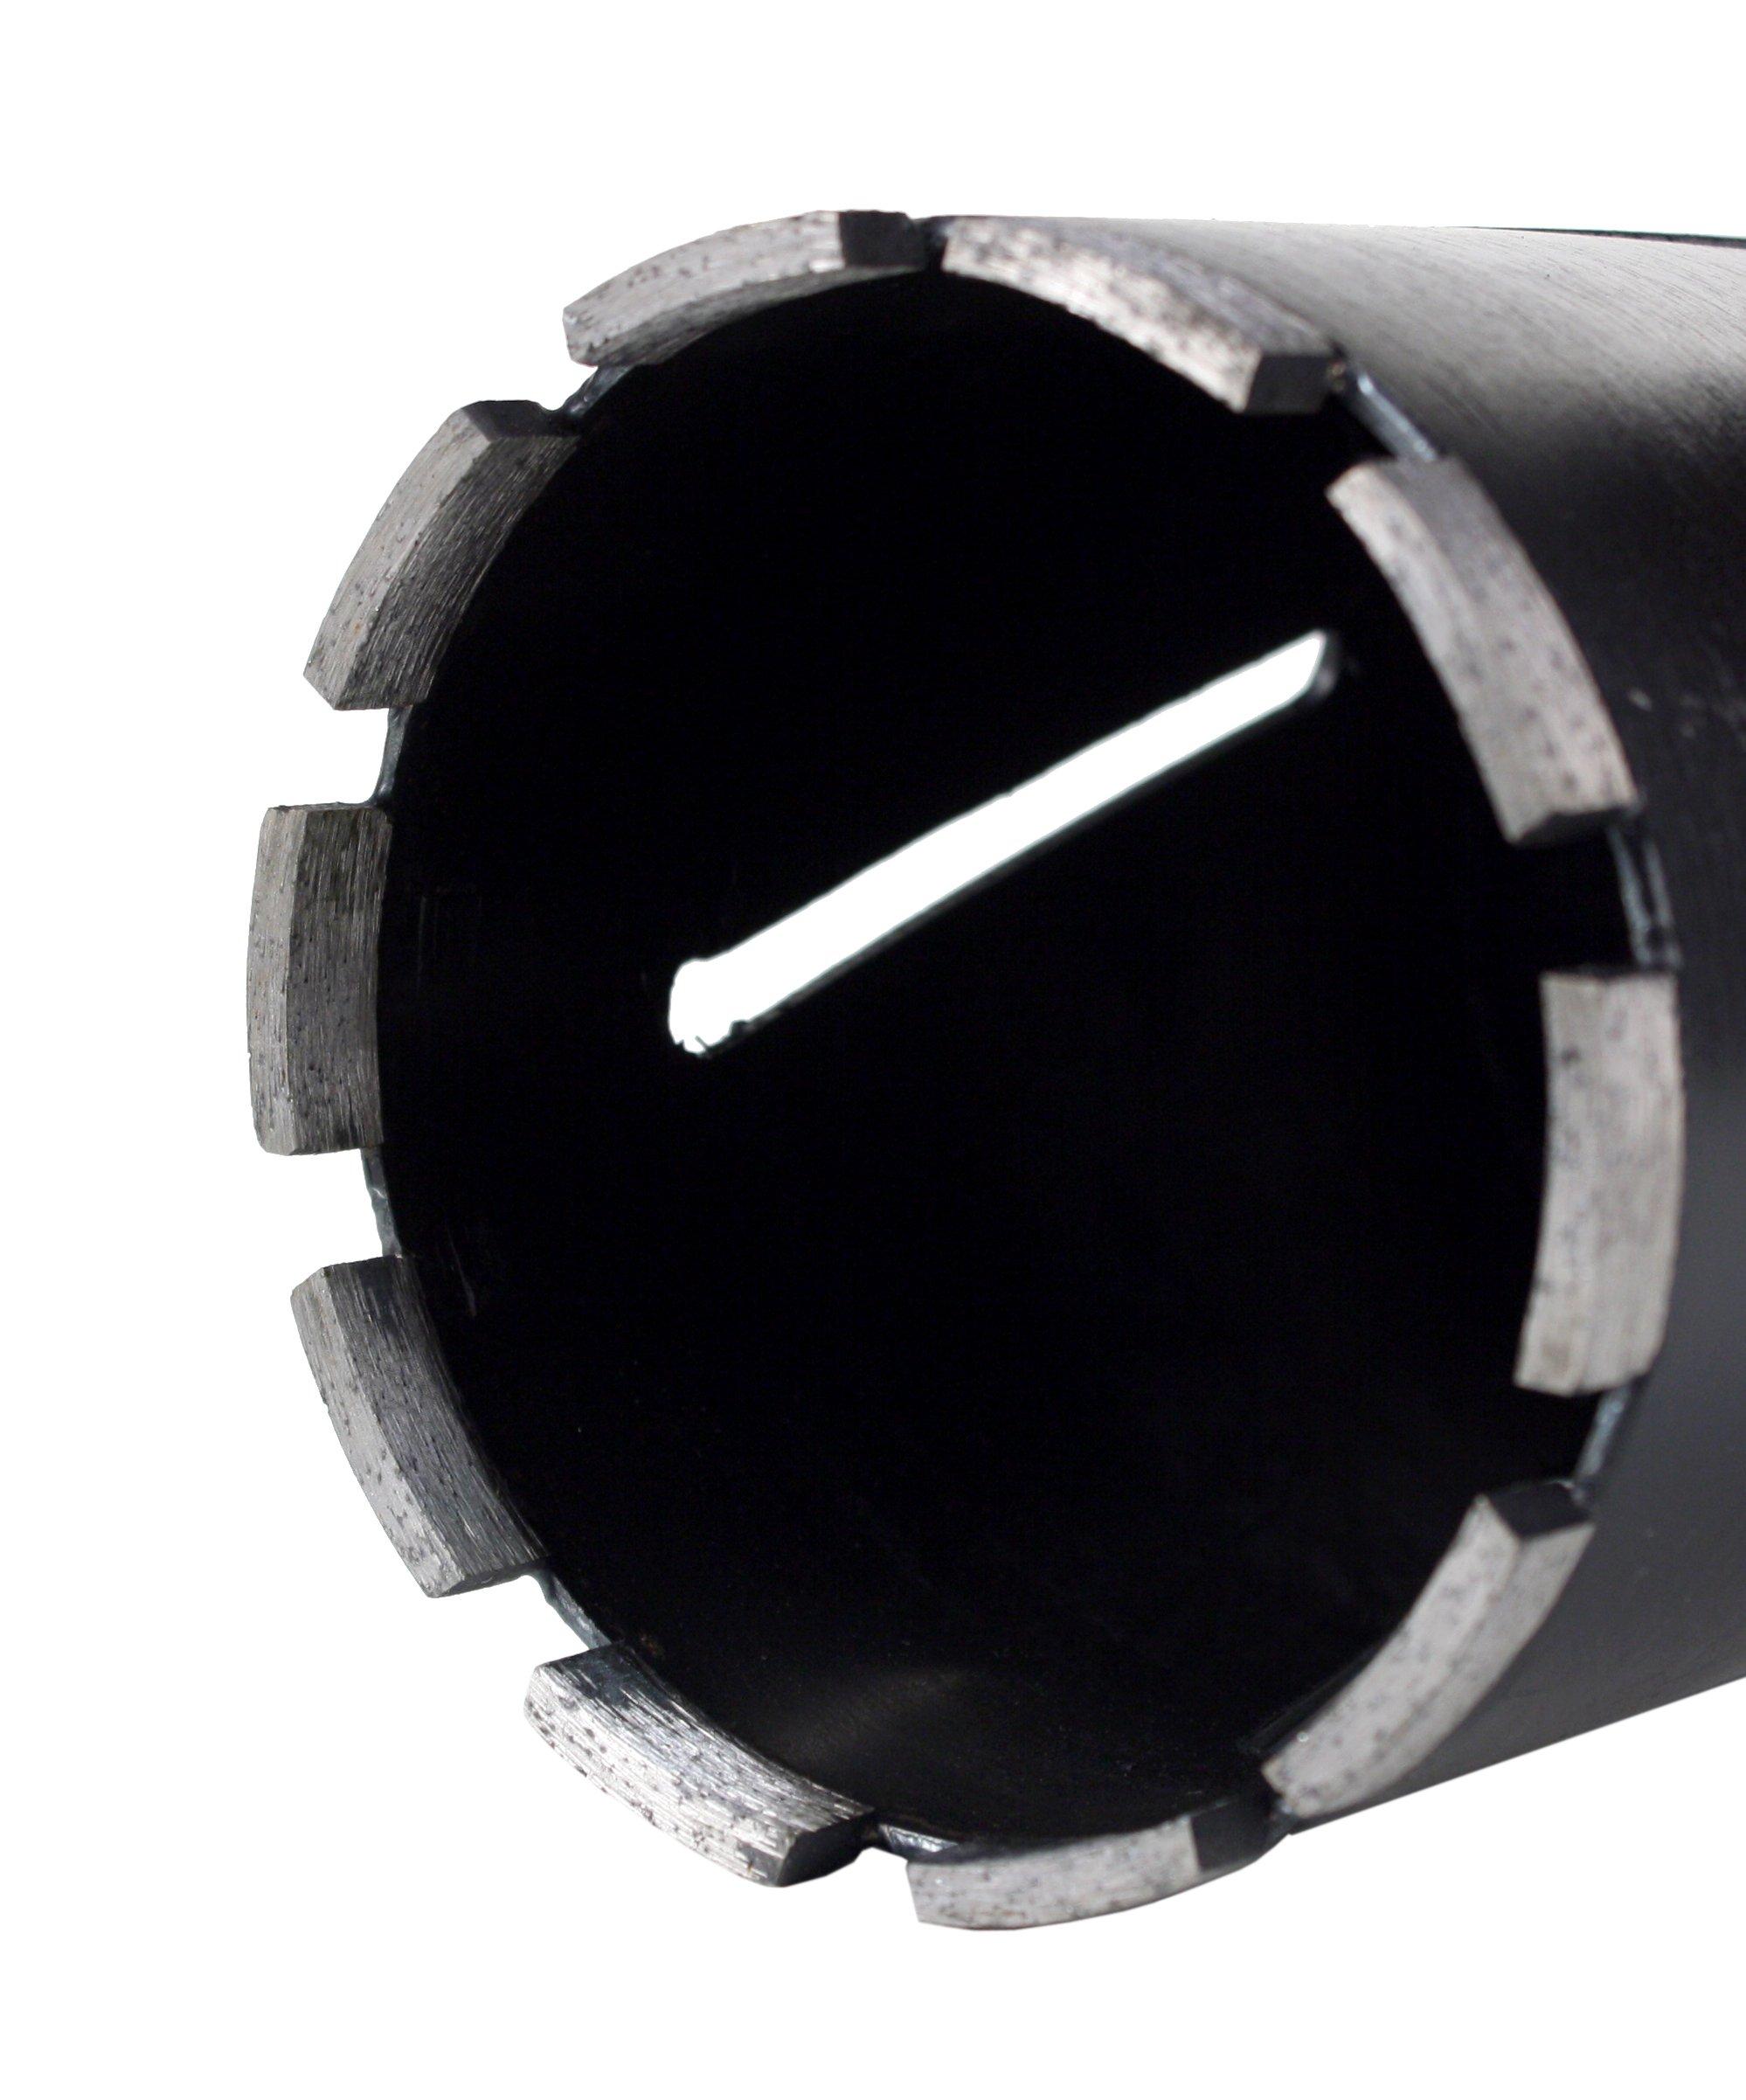 "Steel Dragon Tools 4-1/2"" (114 mm) x 6"" Dry Diamond Masonry Core Drill Bit"